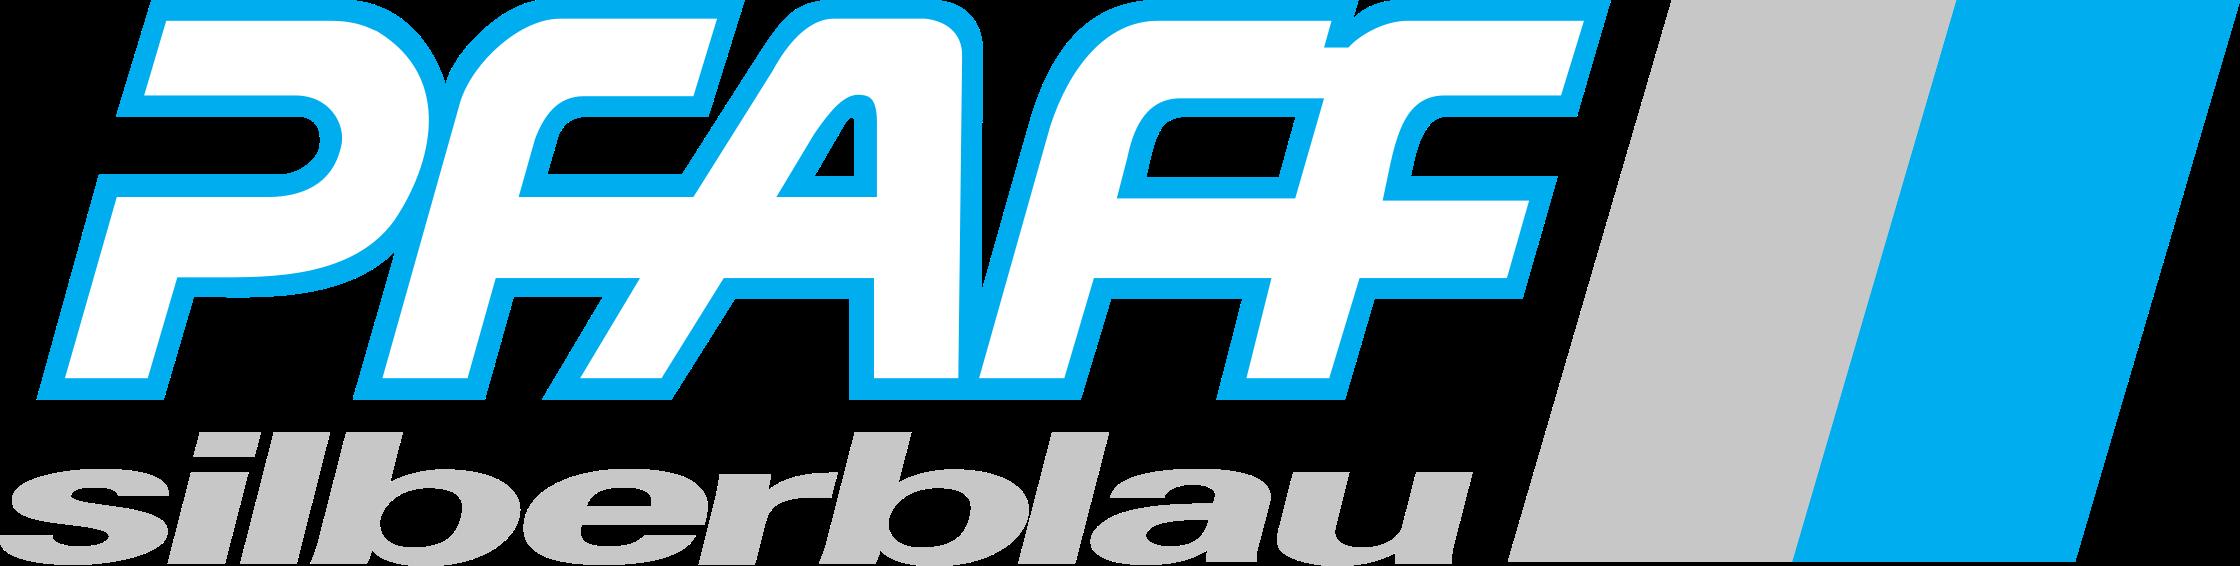 Pfaff bei BWL Osnabrück kaufen